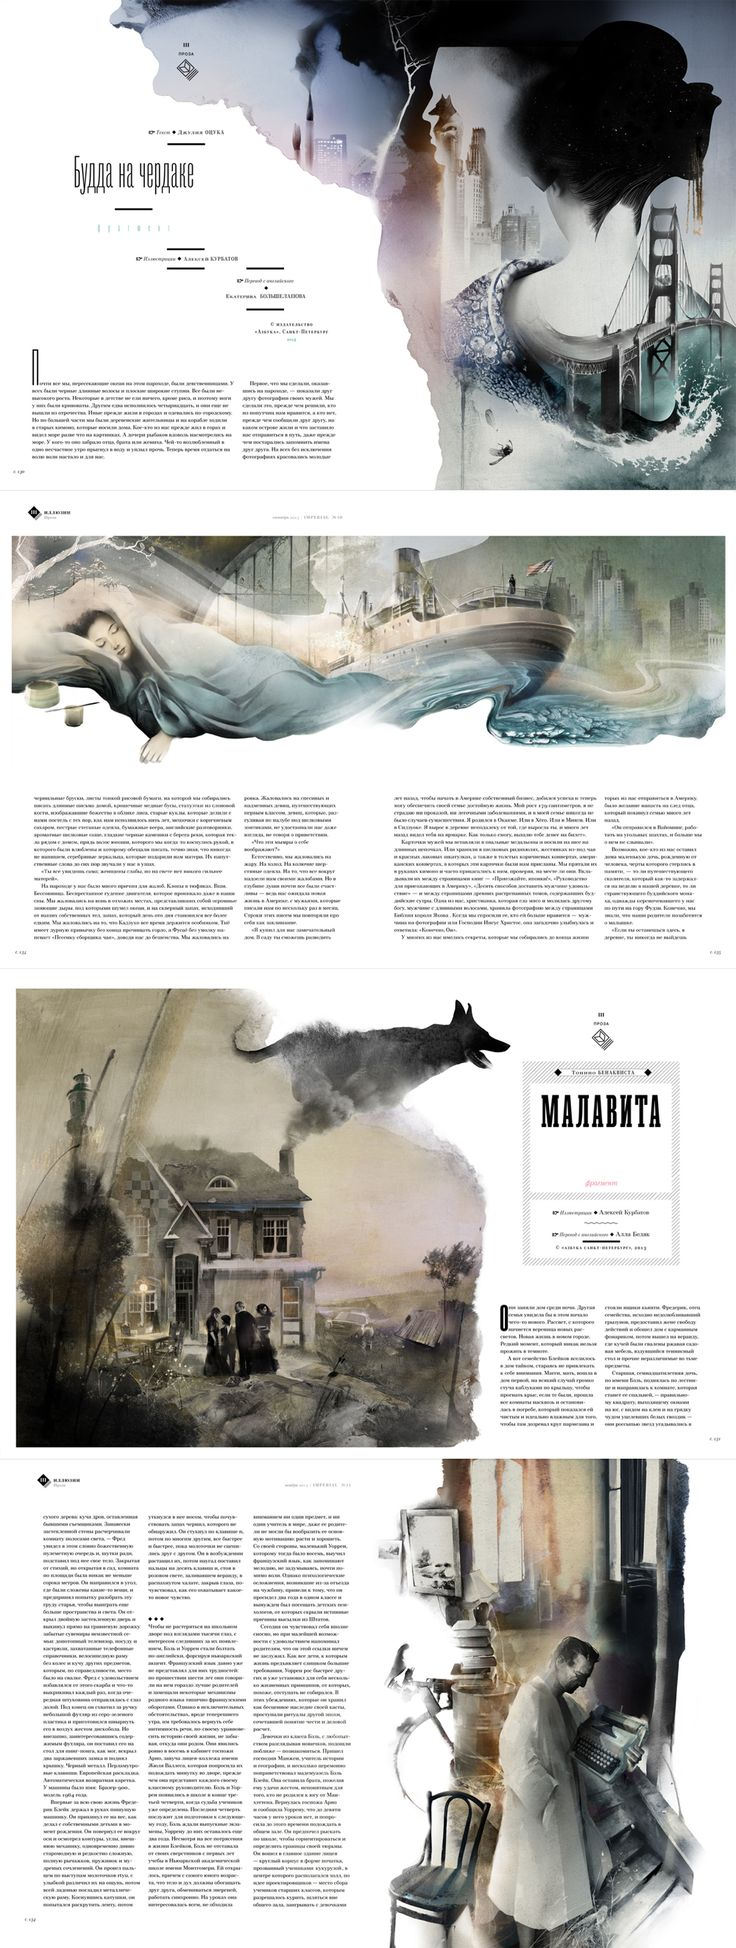 Журнал IMPERIAL, Illustration © ЛёшаКурбатов